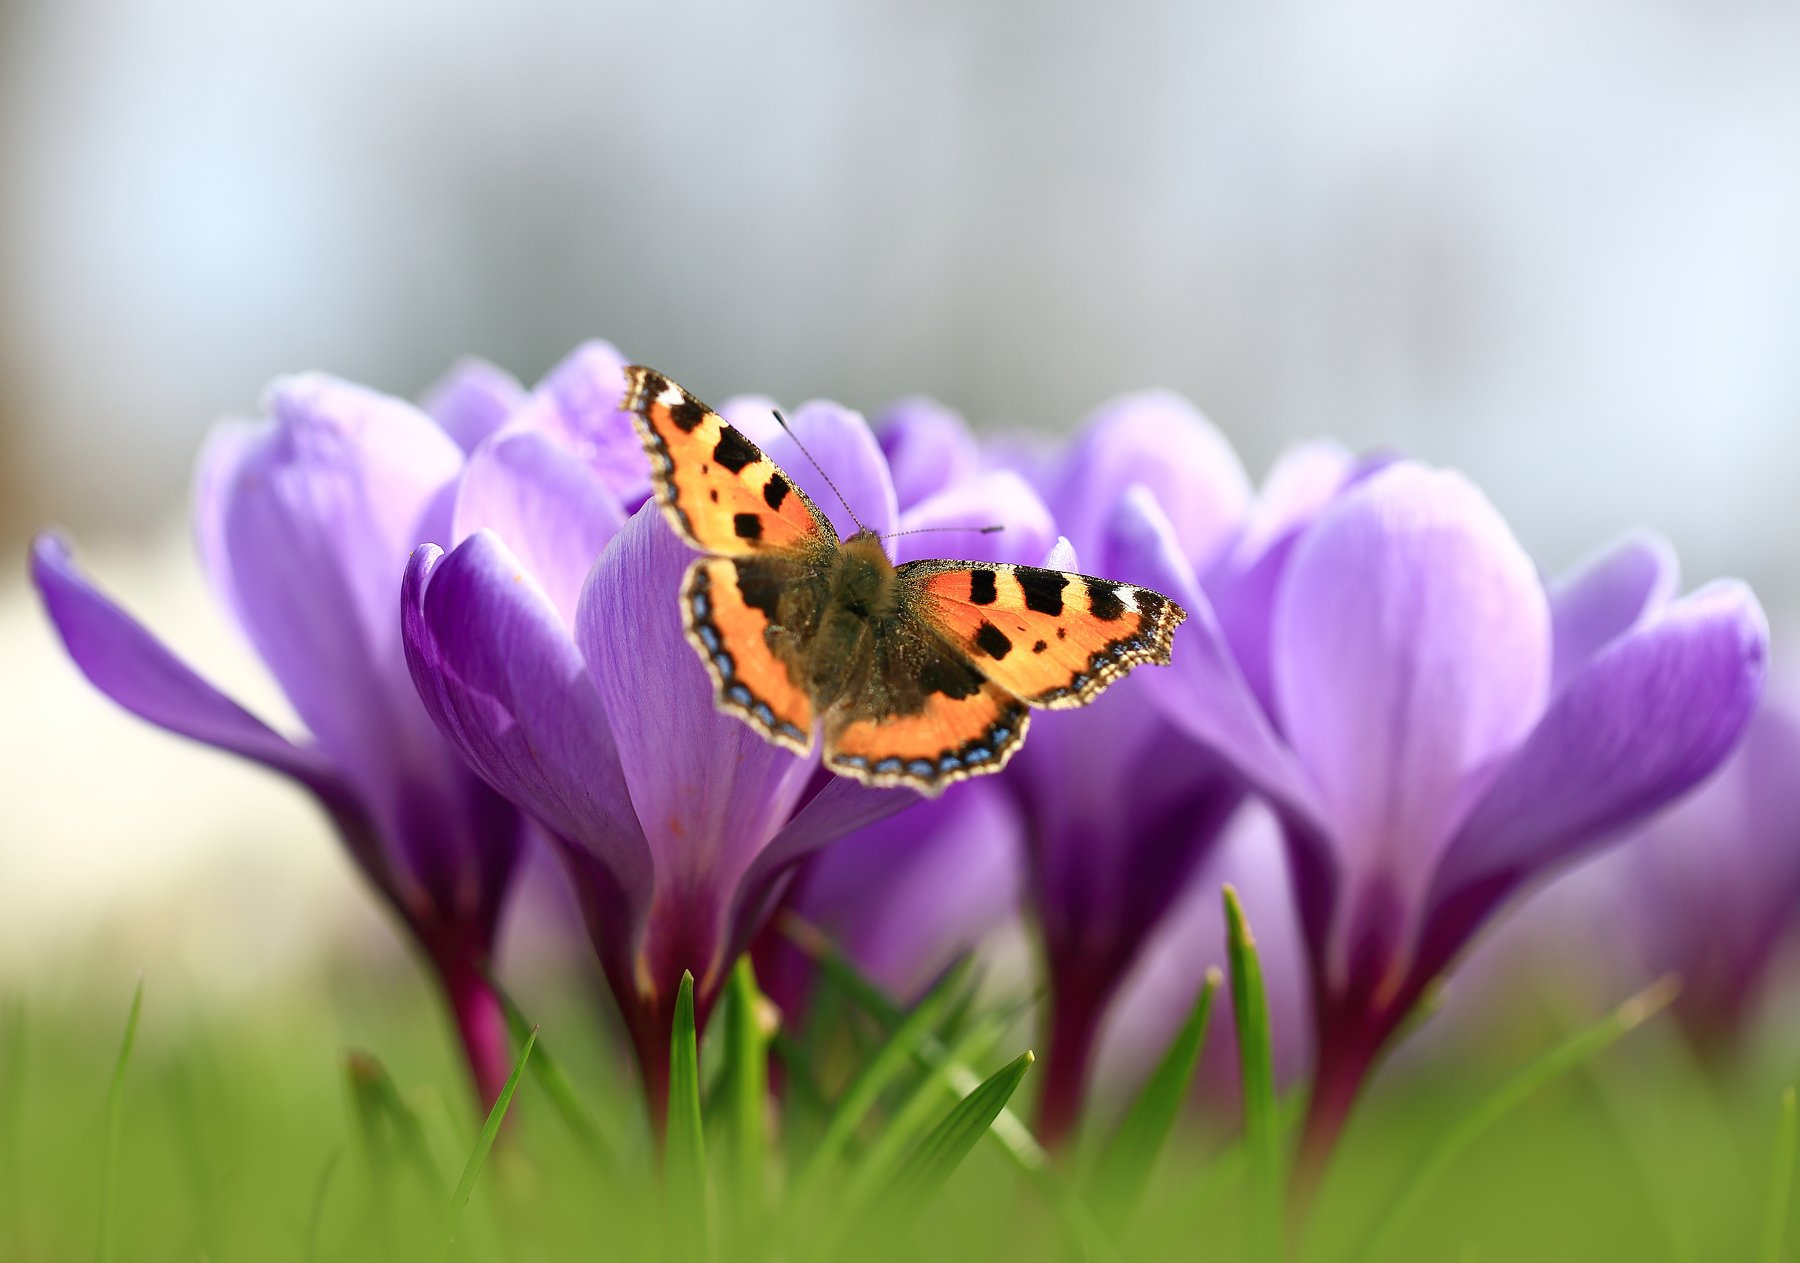 Весна,цветы,бабочка,крокусы., Виктор Шнайдер